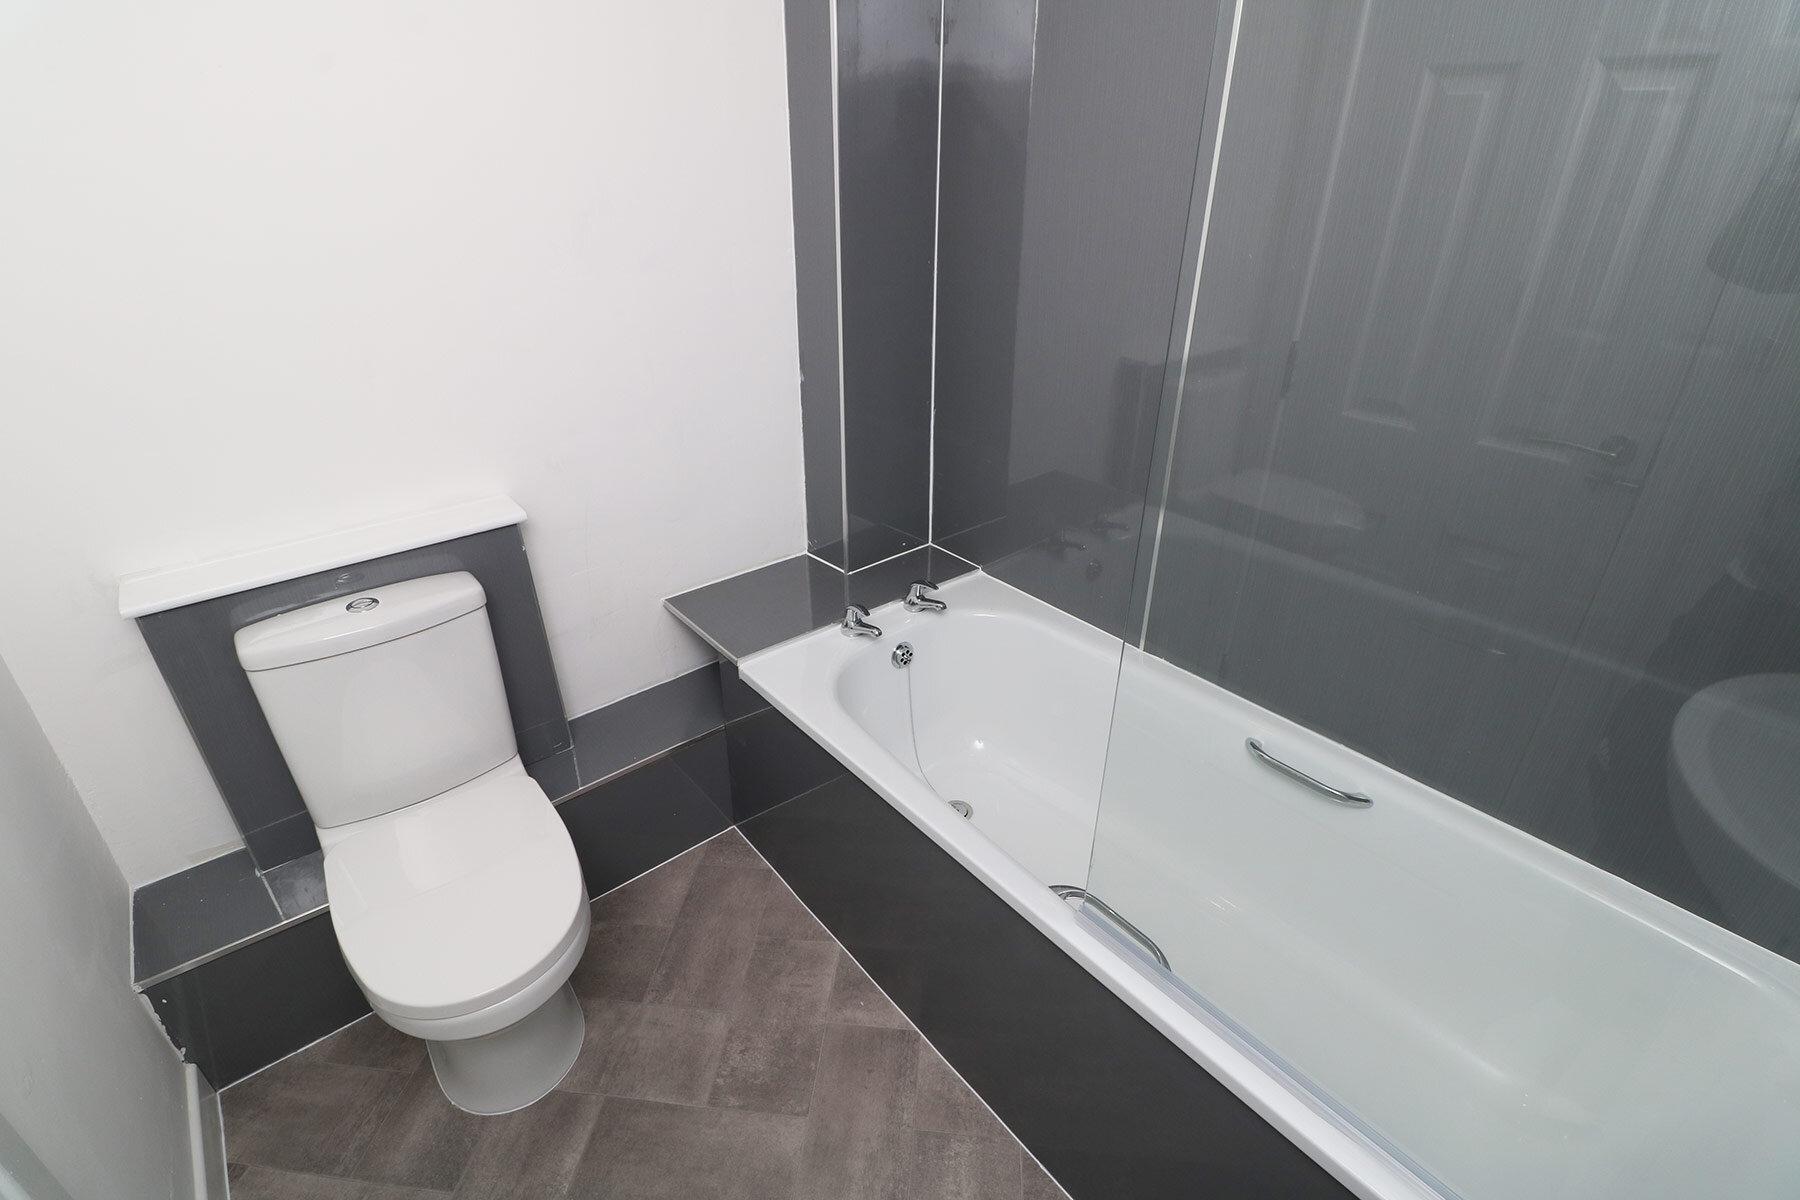 provost-road-after-bathroom-1.jpg